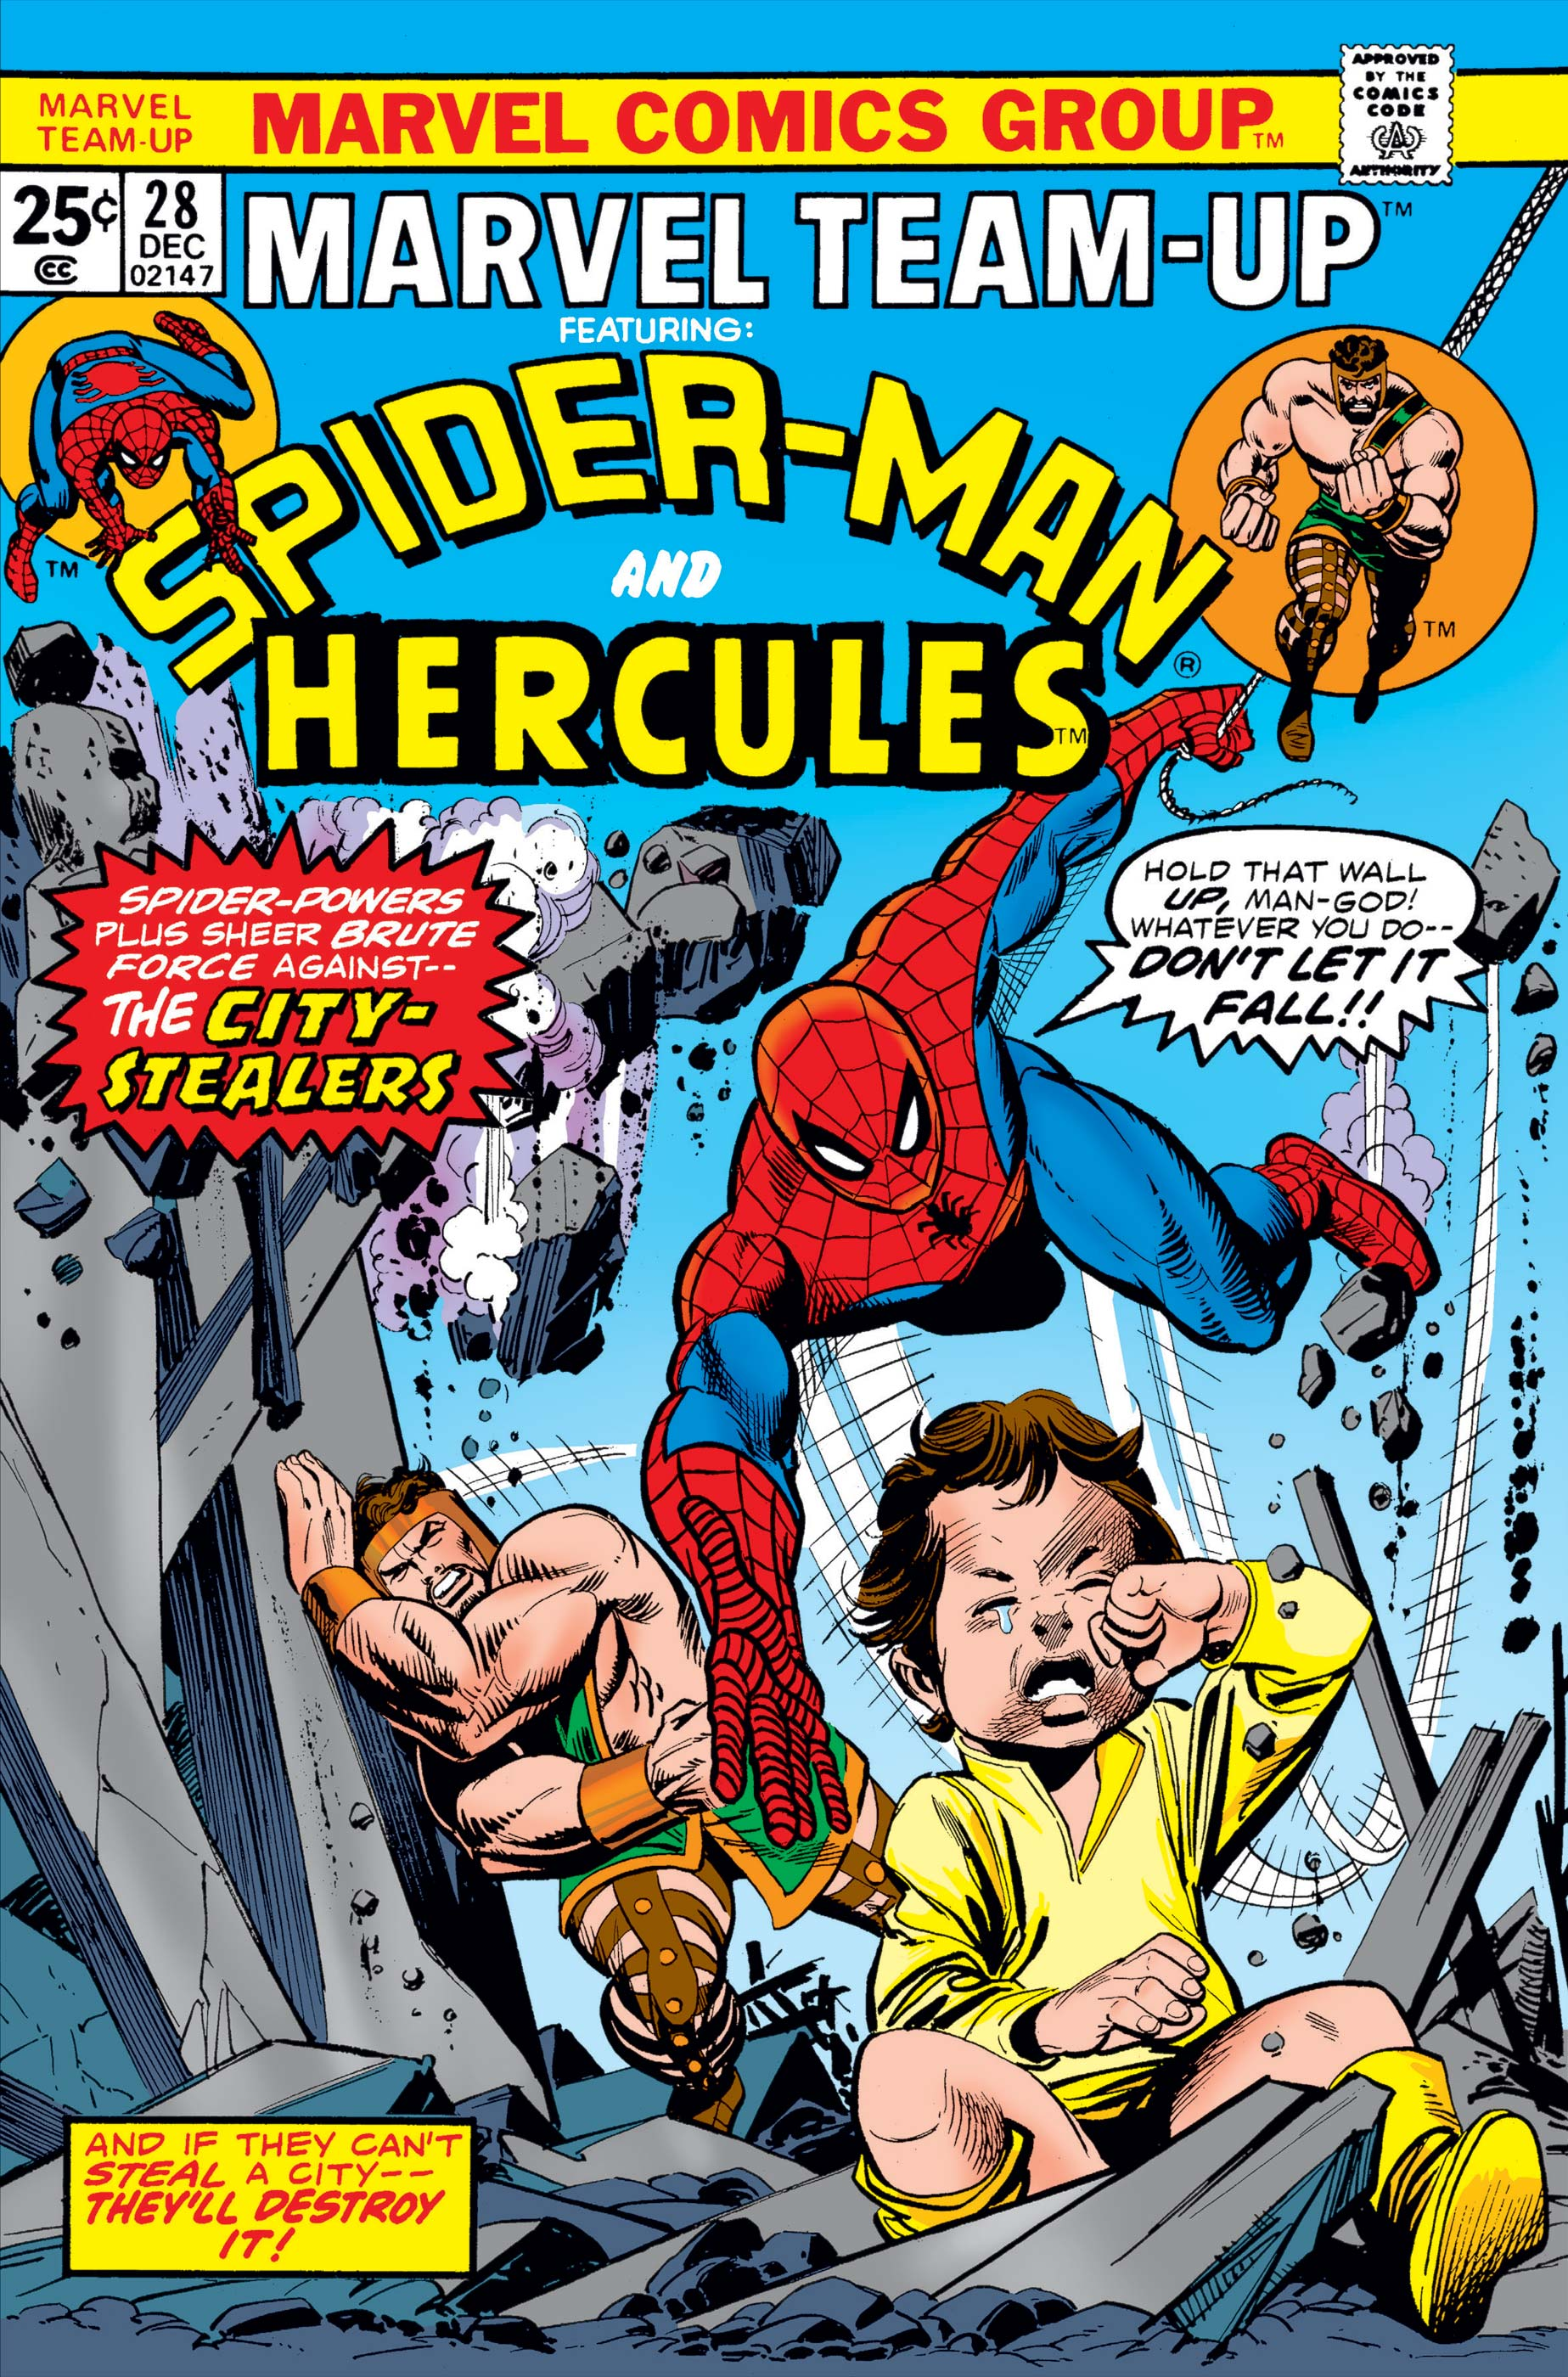 Marvel Team-Up (1972) #28